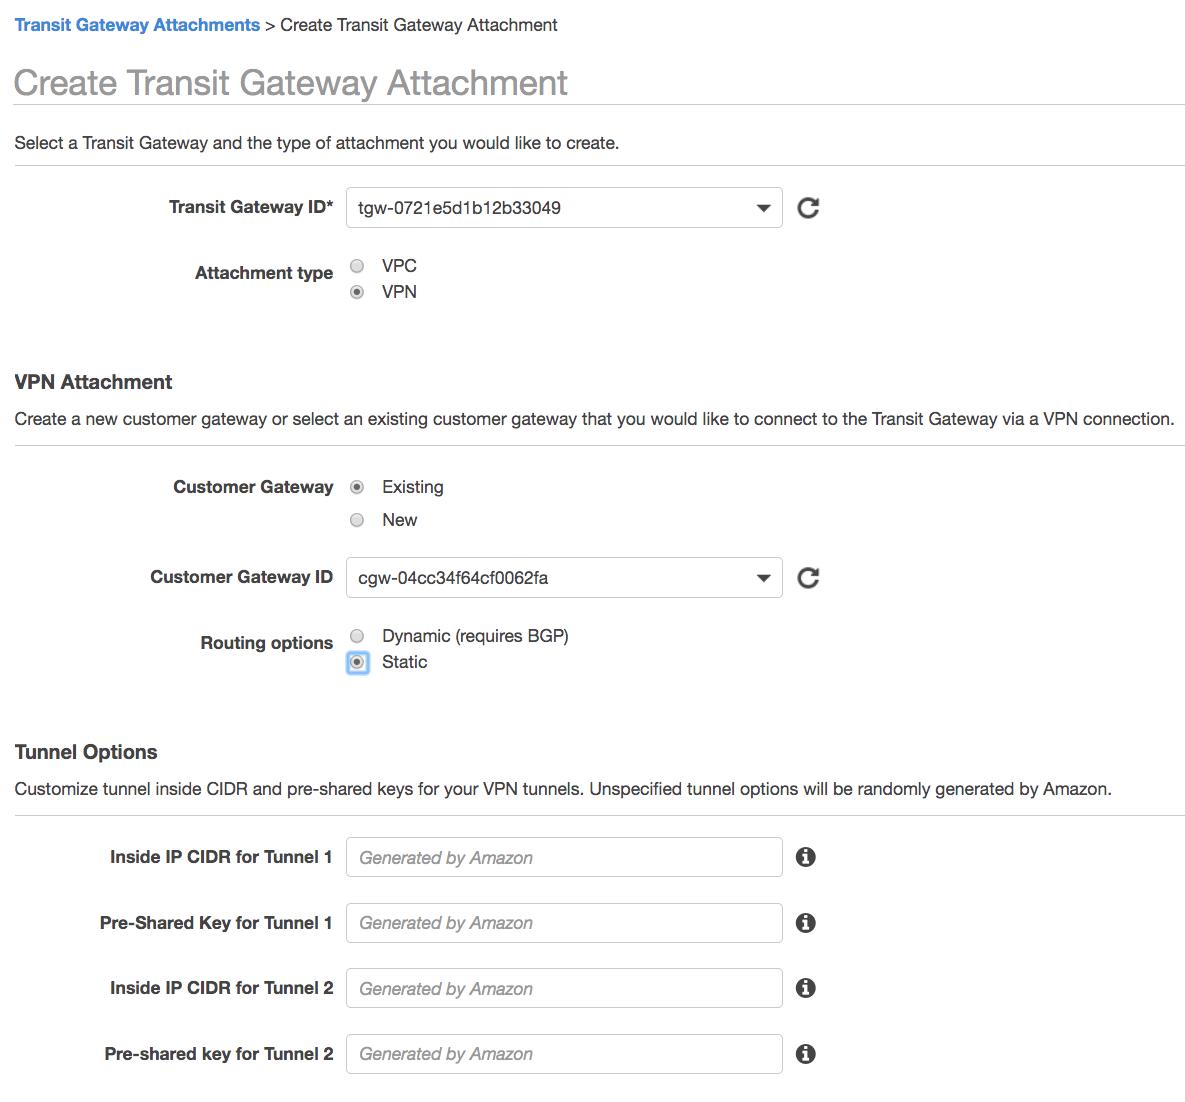 create-transit-gateway-attachment-vpn.png